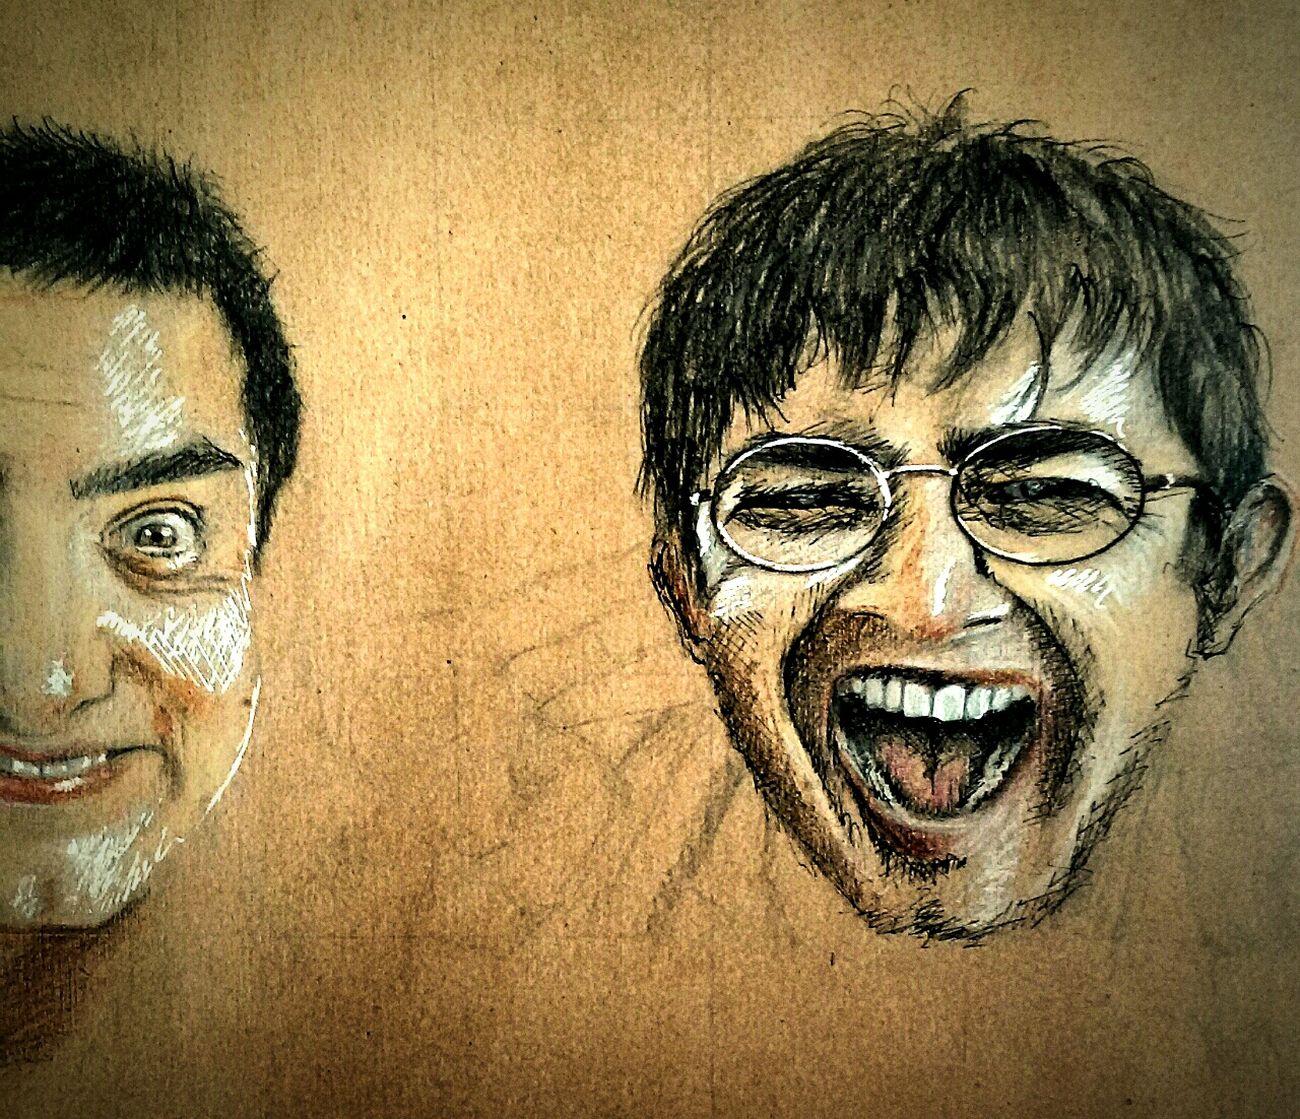 💥 3idiots 💥 Aamirkhan 3idiots First Eyeem Photo Art ArtWork Artgallery Drawing Draw Sketch